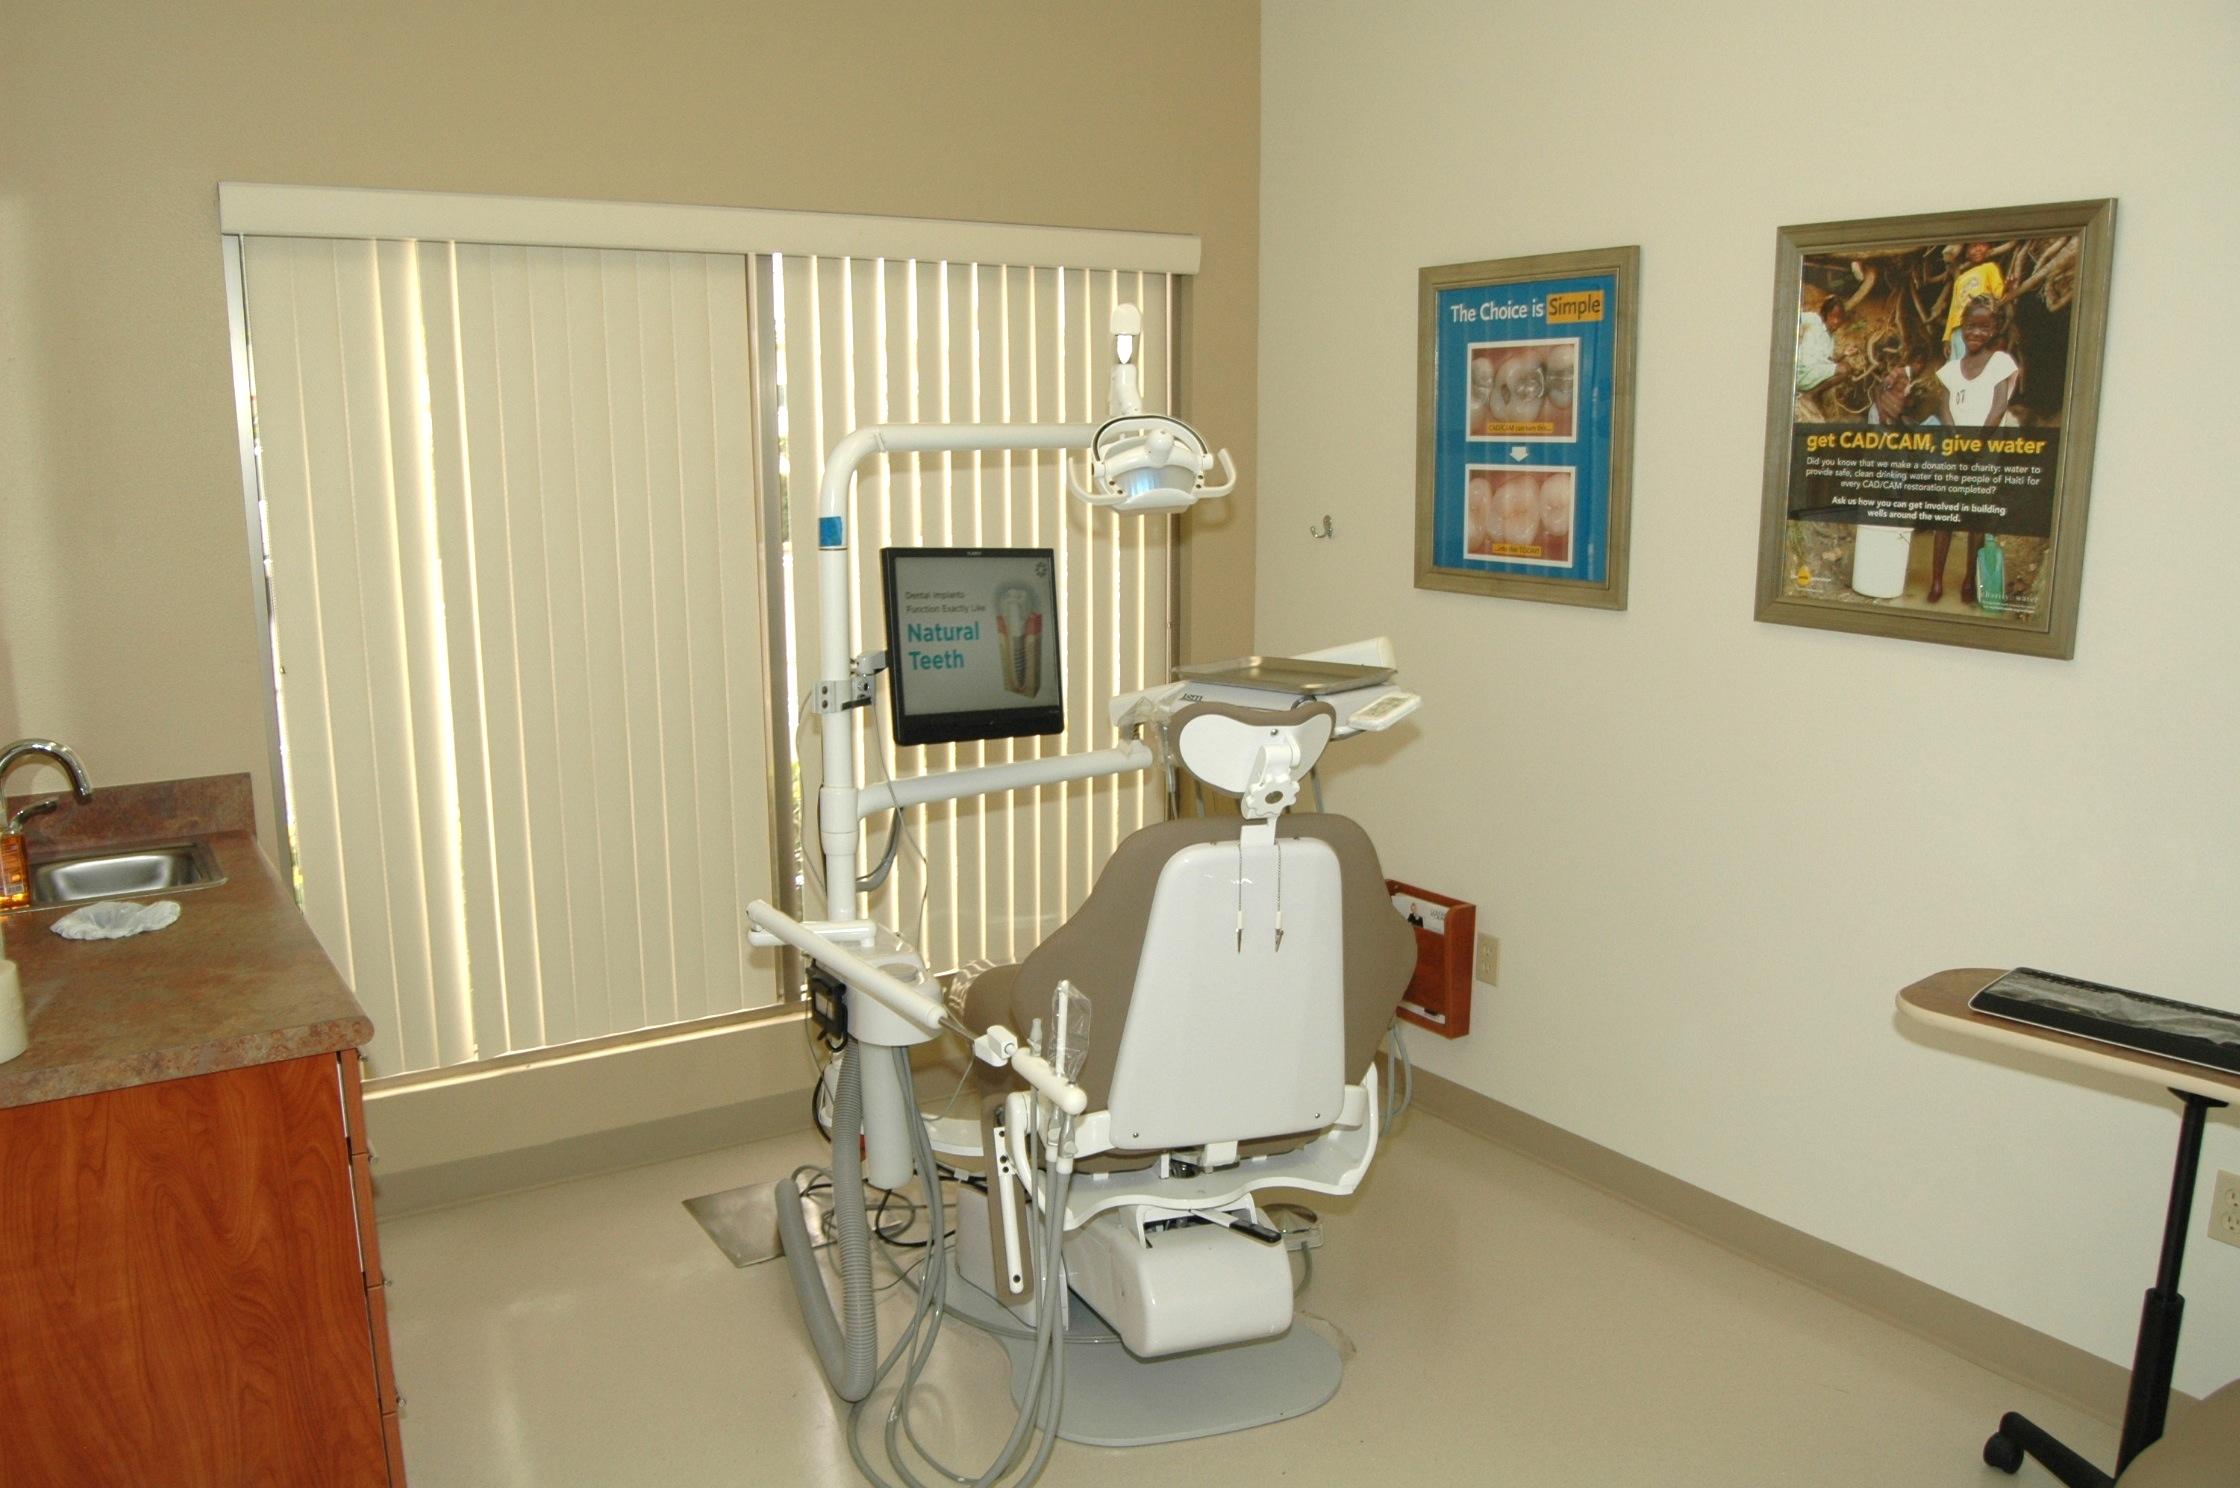 Yorba Linda Smiles Dentistry and Orthodontics image 5